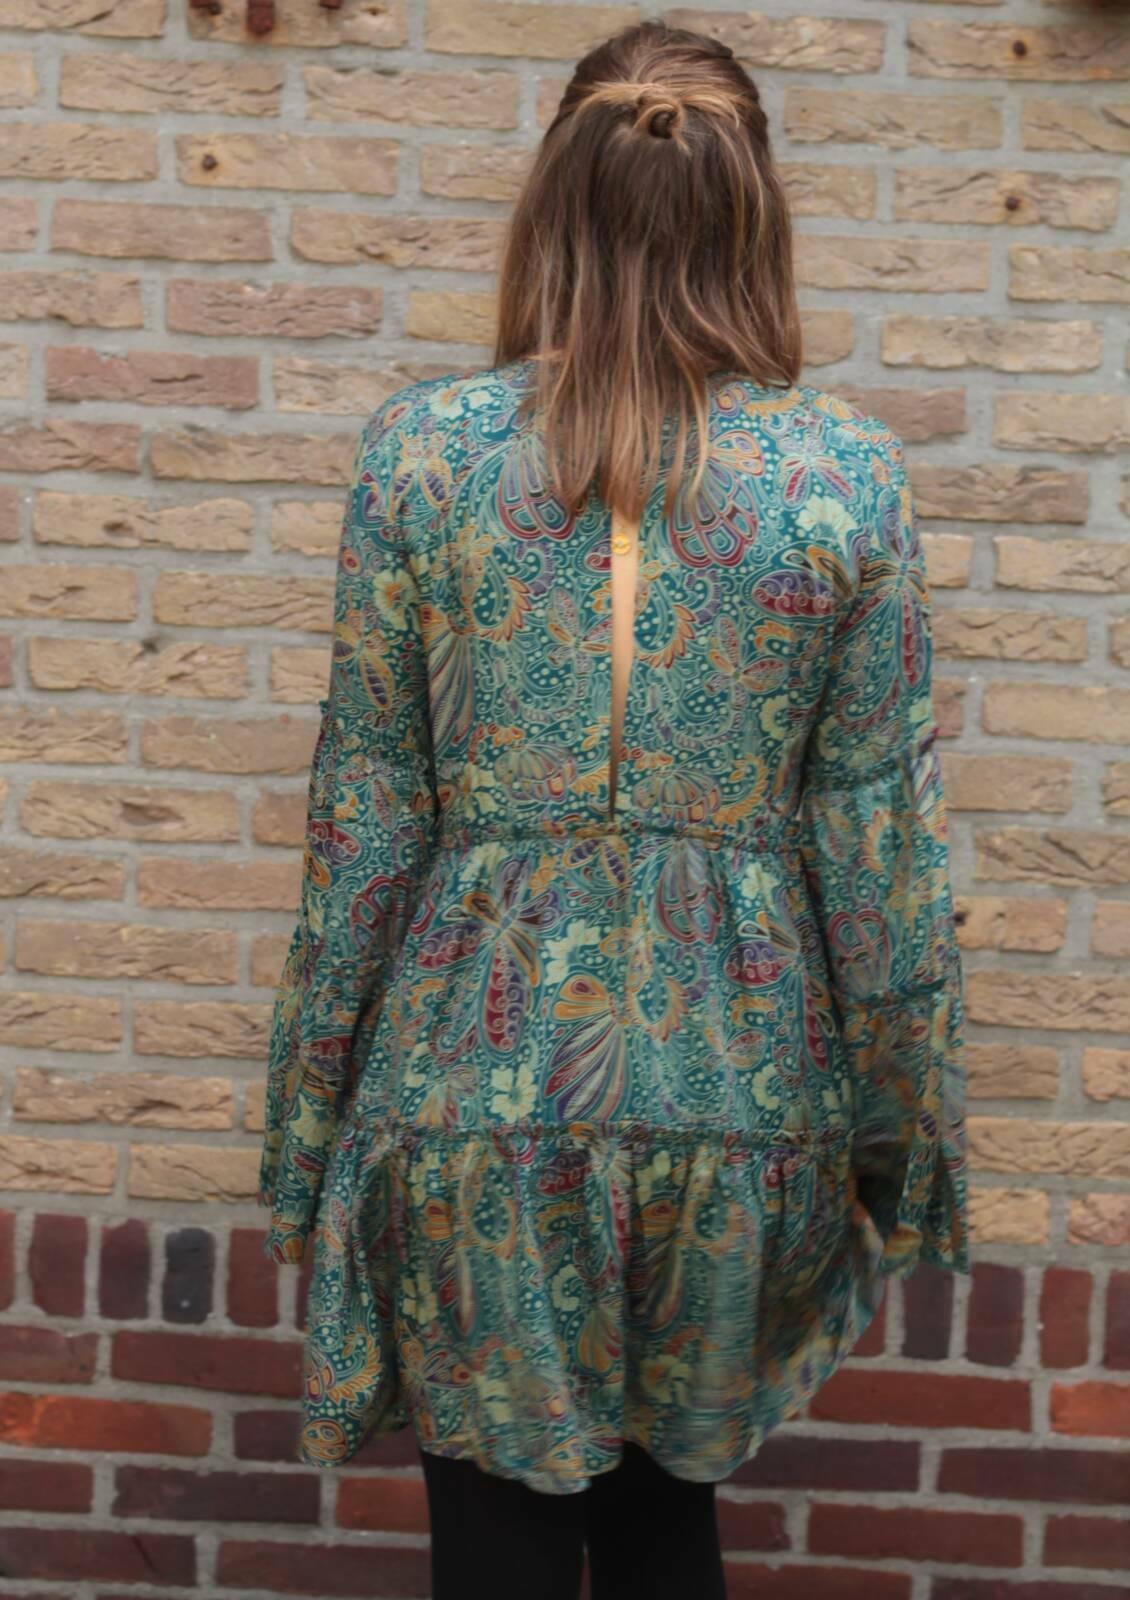 Boho Kleid Langarm mit Trompetenärmel Rückenfrei